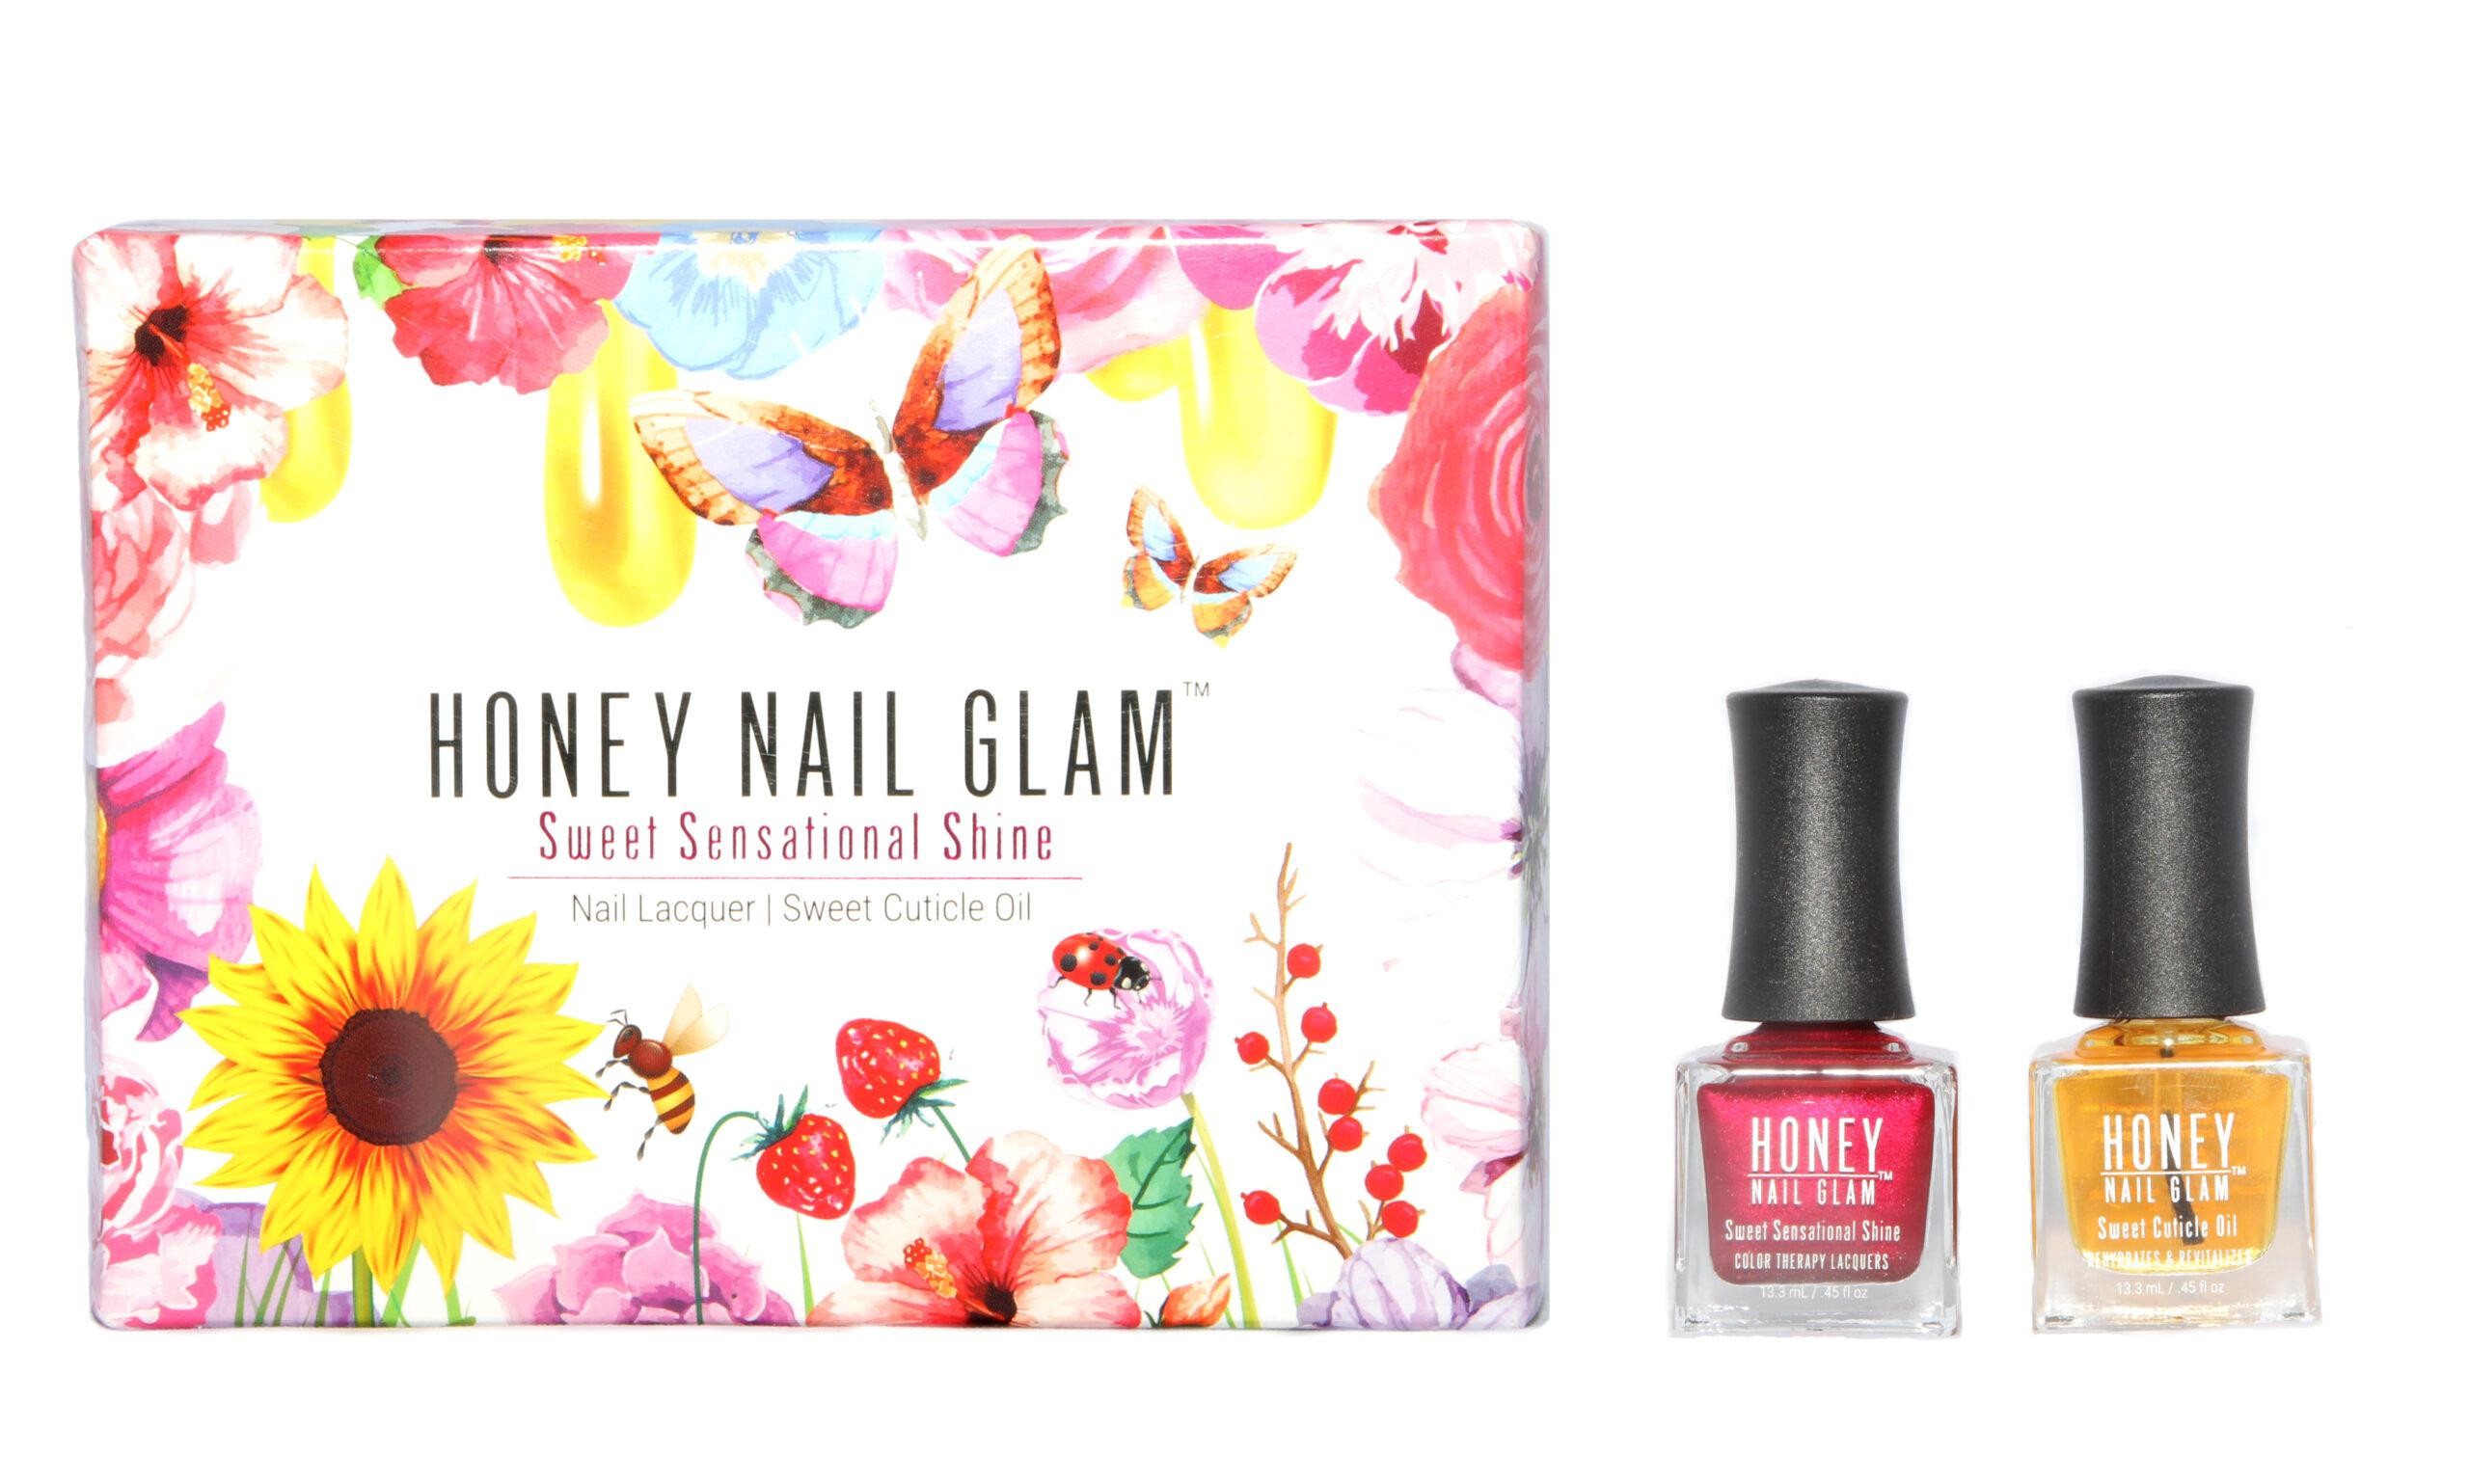 Honey Nail Glam, nails, body care